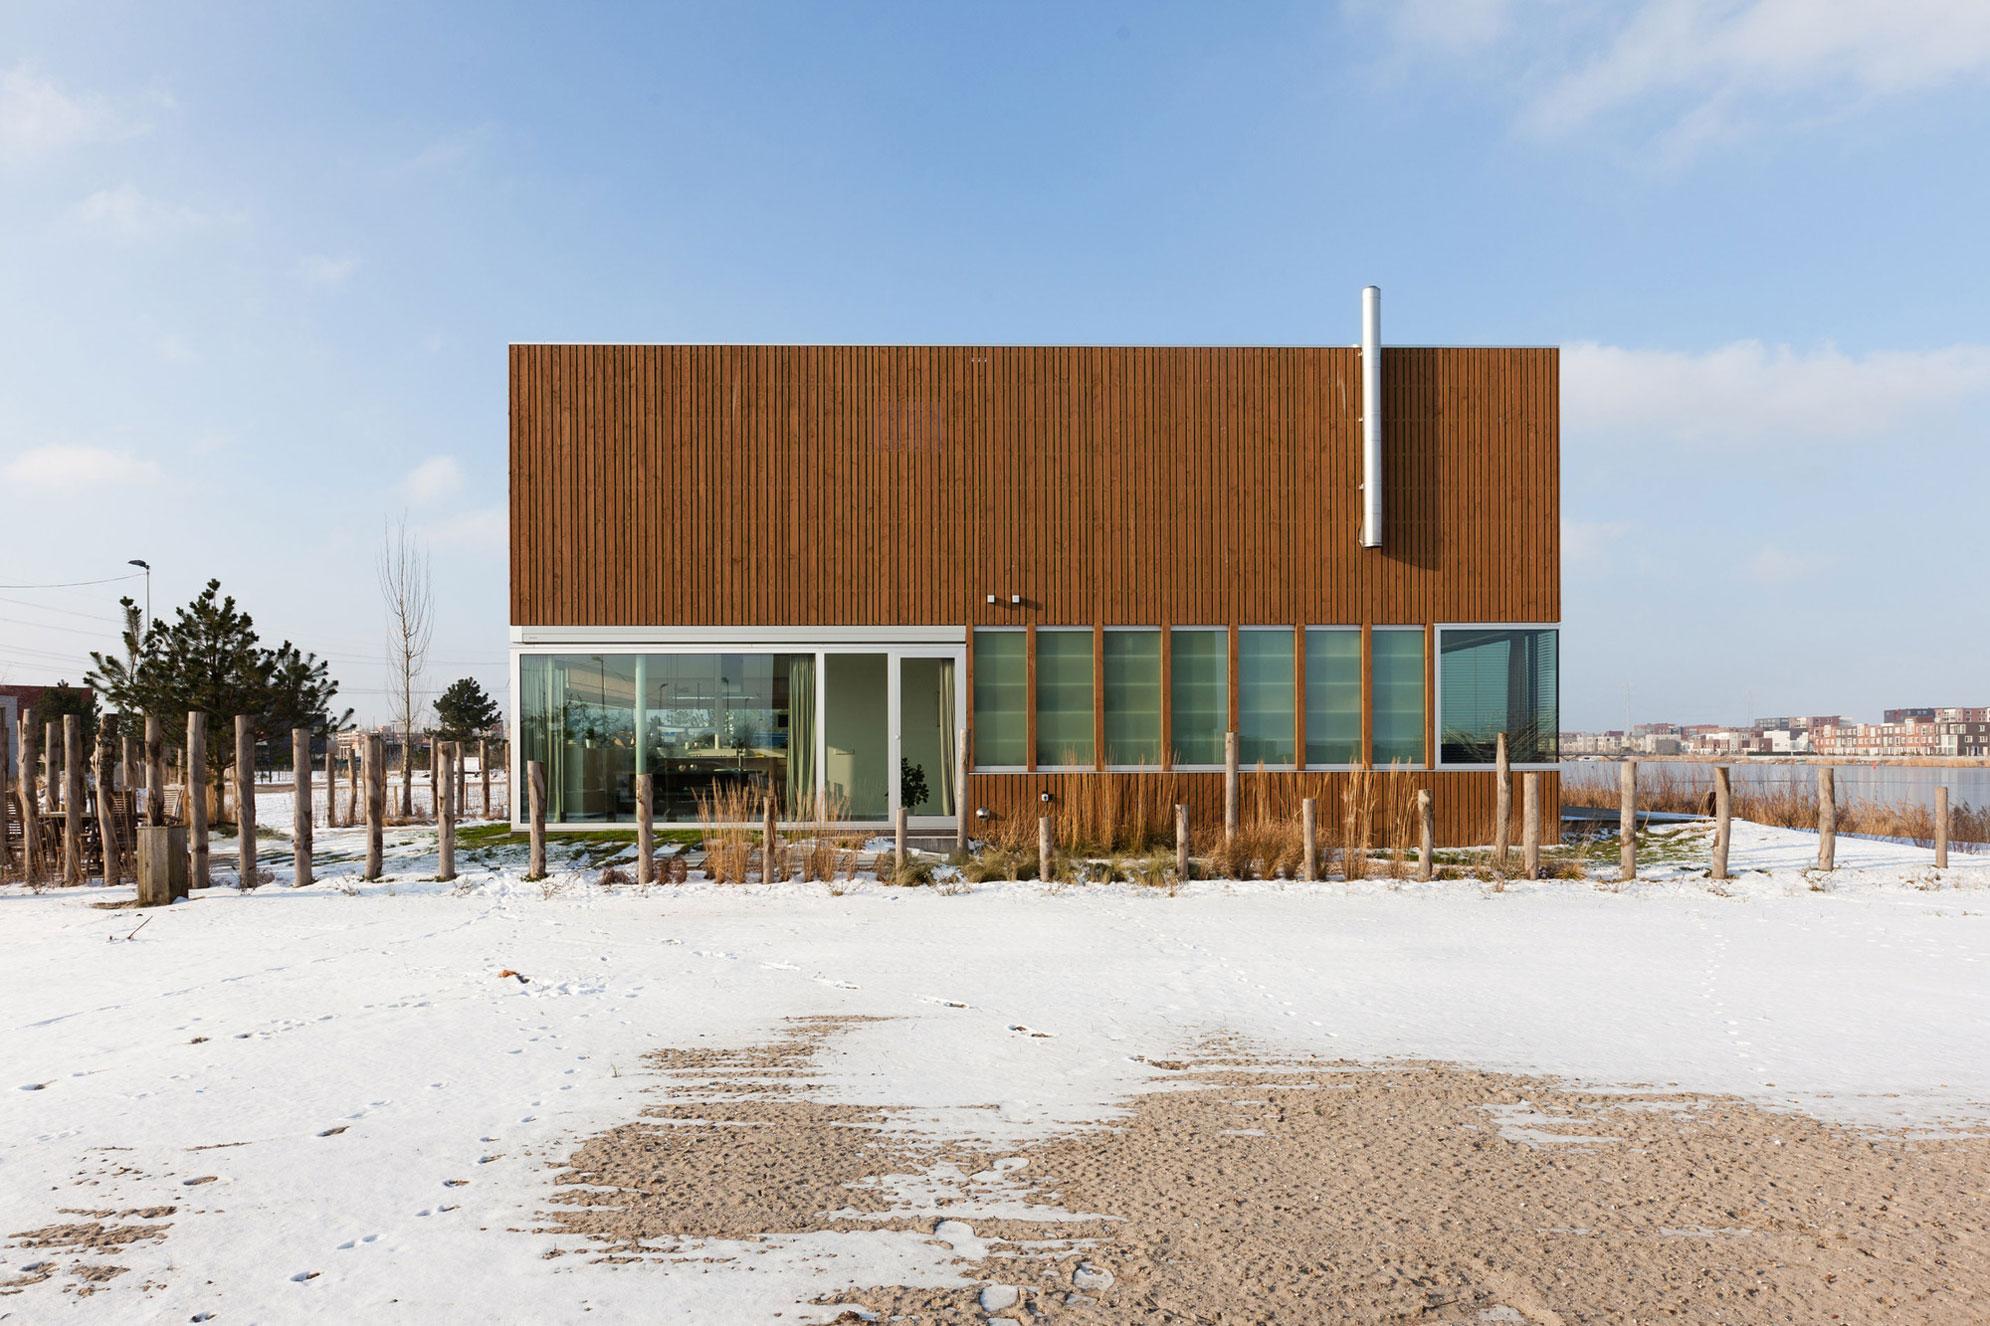 Ijburg villa by marc prosman architecten homedezen